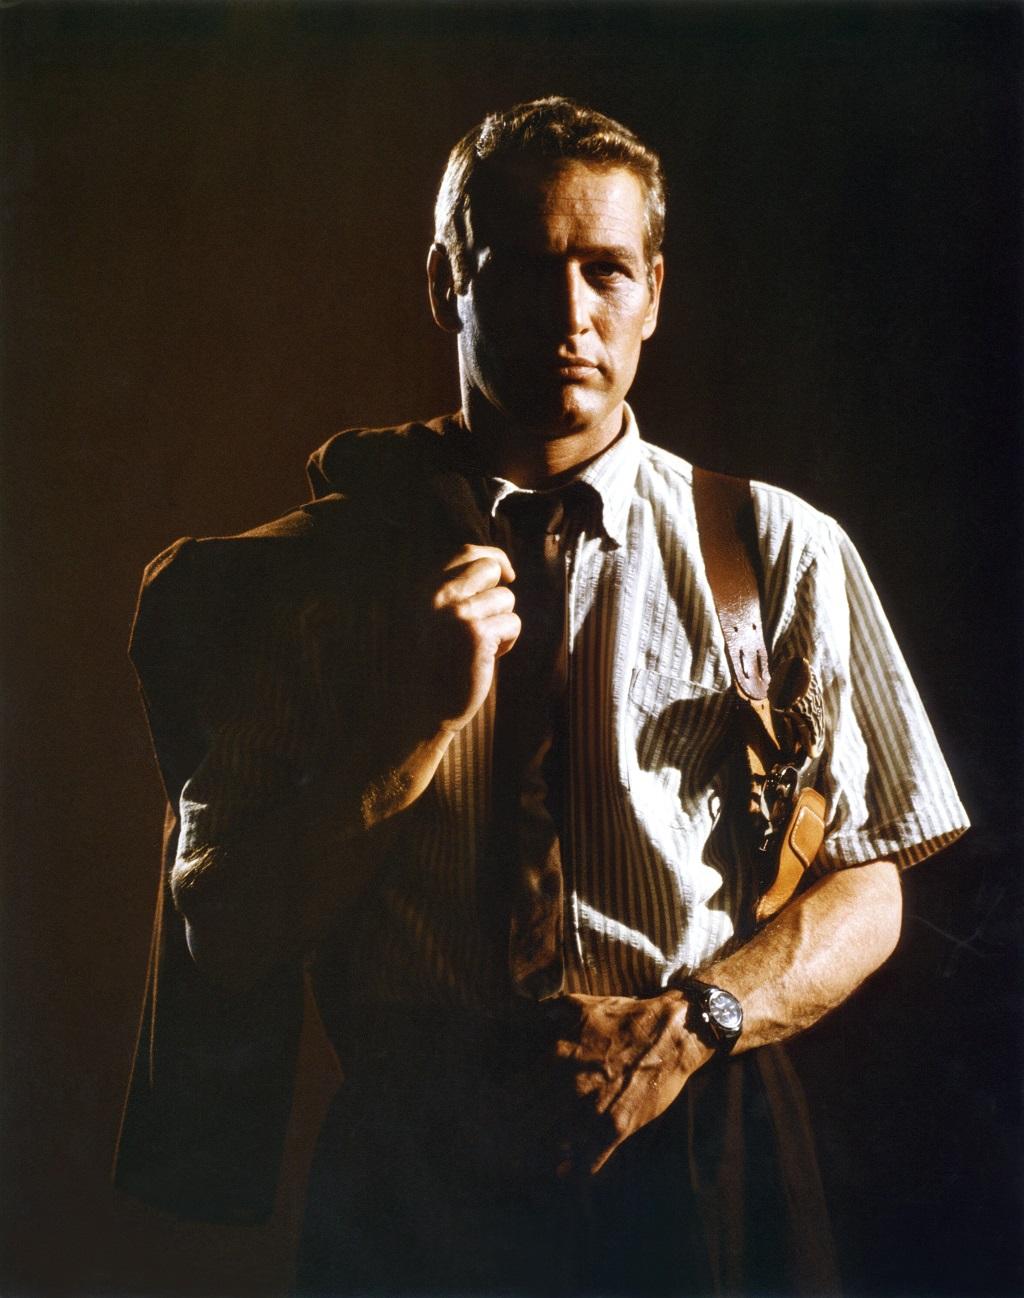 Paul Newman Waltham. Picture (C) CHRISTOPHEL / RnB © Warner Bros